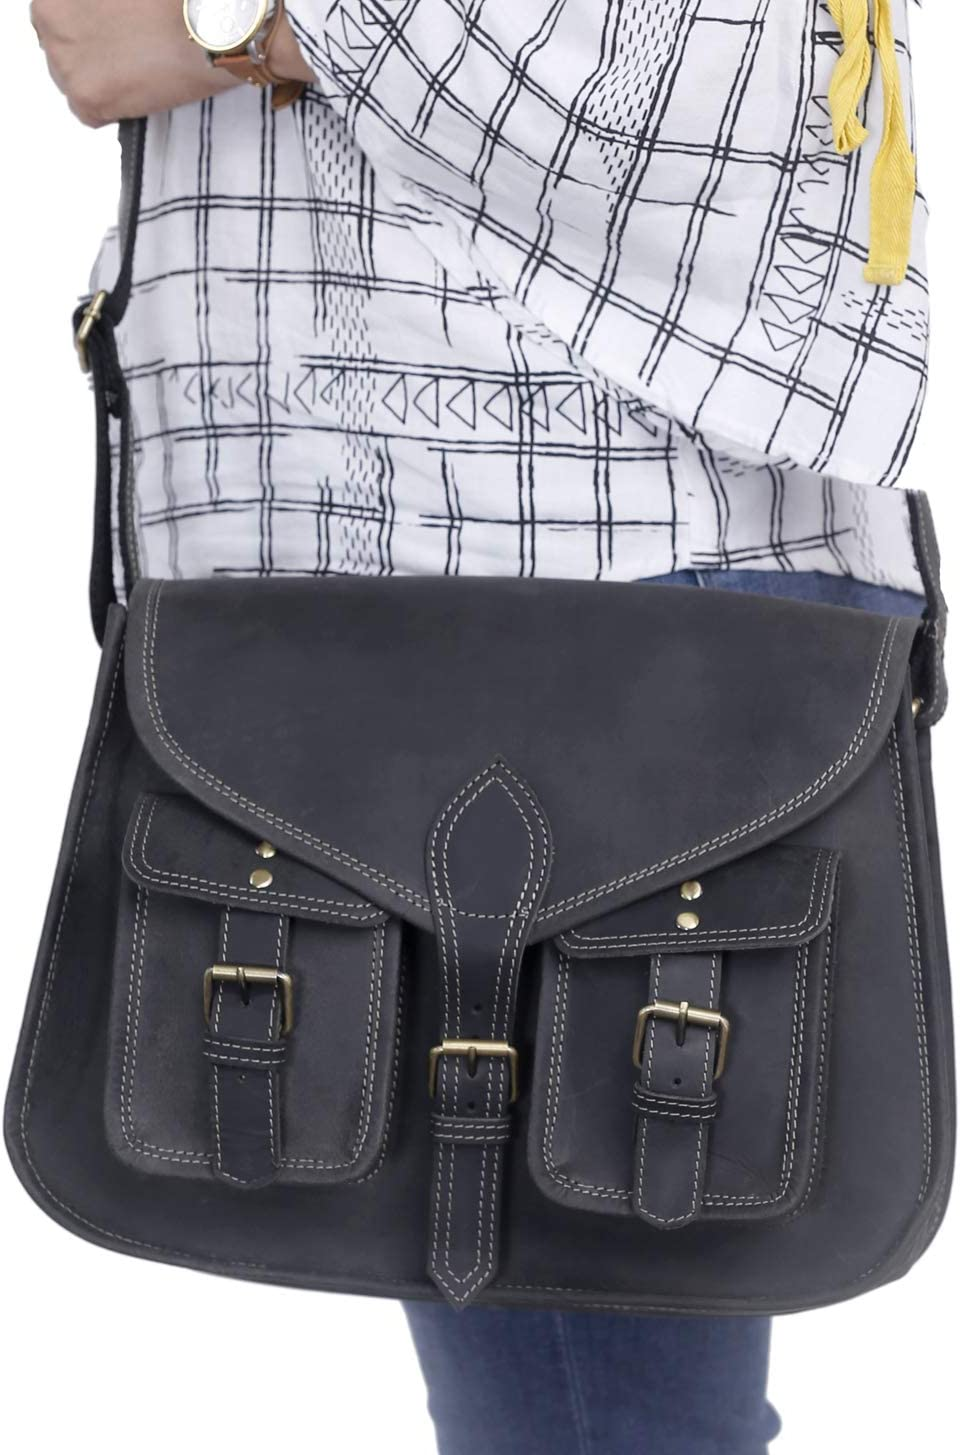 1 PCS Adjustable Black  Coffee  Camel PU leather Shoulder Bag Purse  Messenger Bag Purse  Tote Strap with Bronze Lobster Clasp